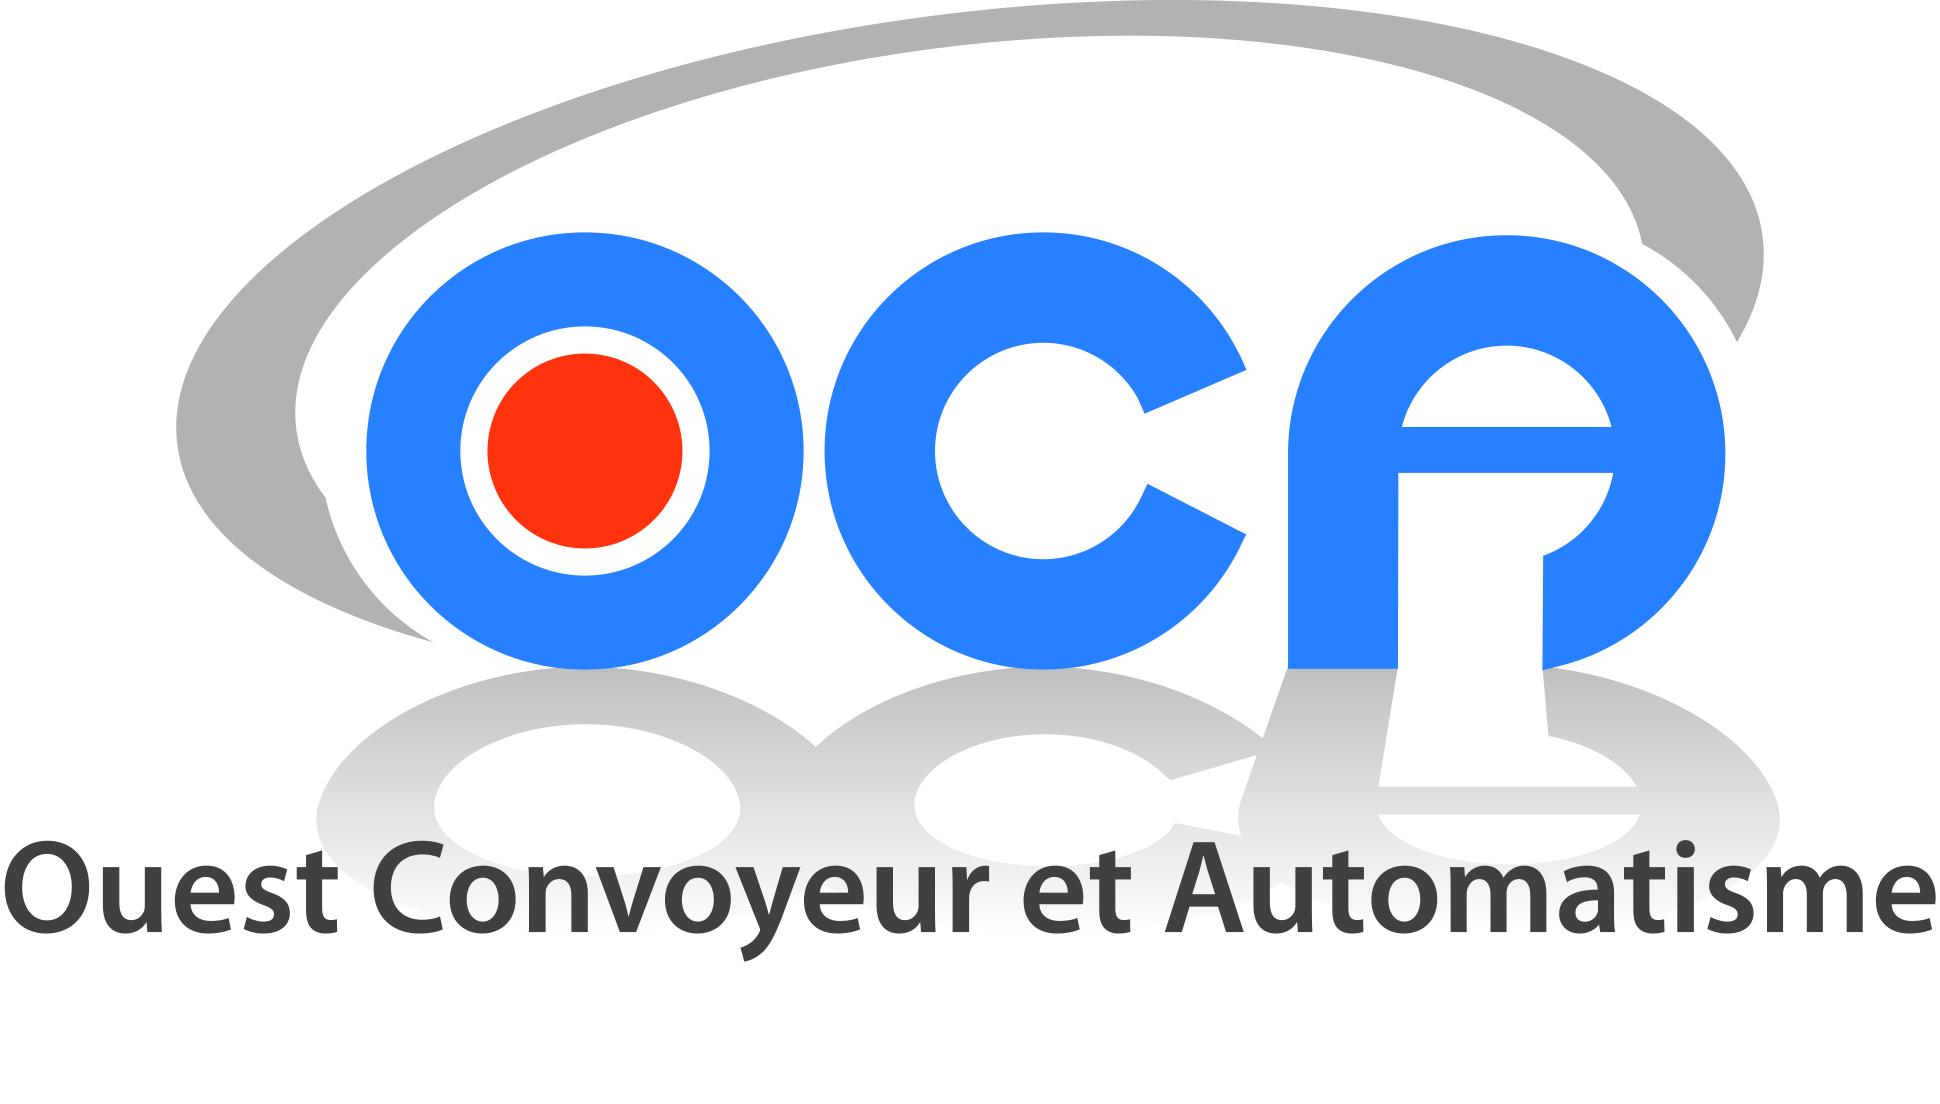 1559828277-oca-ouest-convoyeur-et-automatisme.jpg